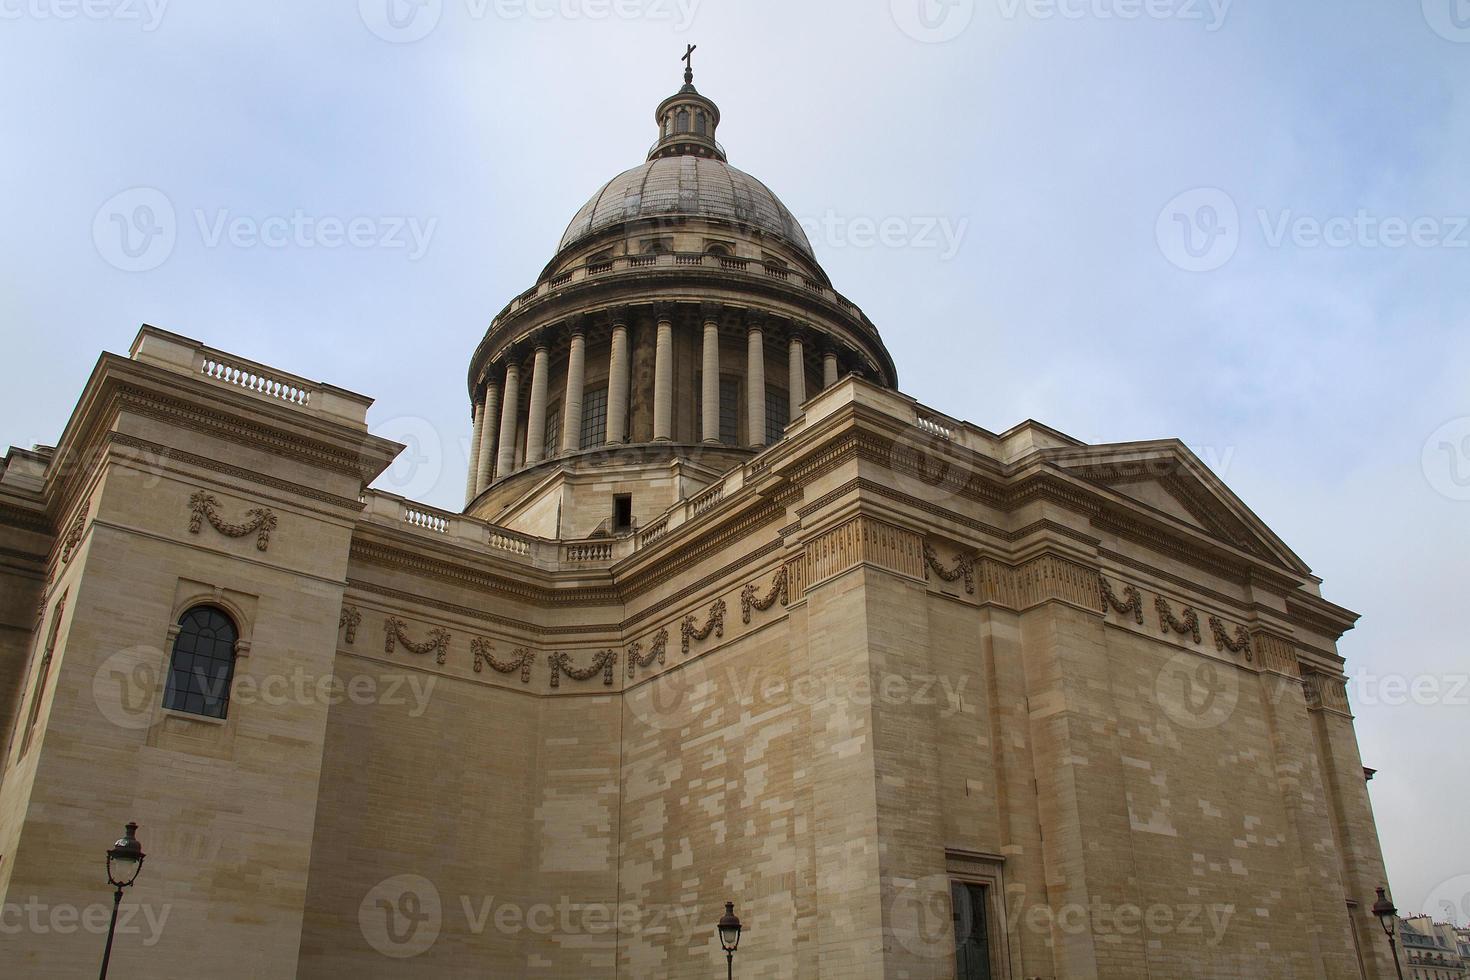 The Pantheon photo